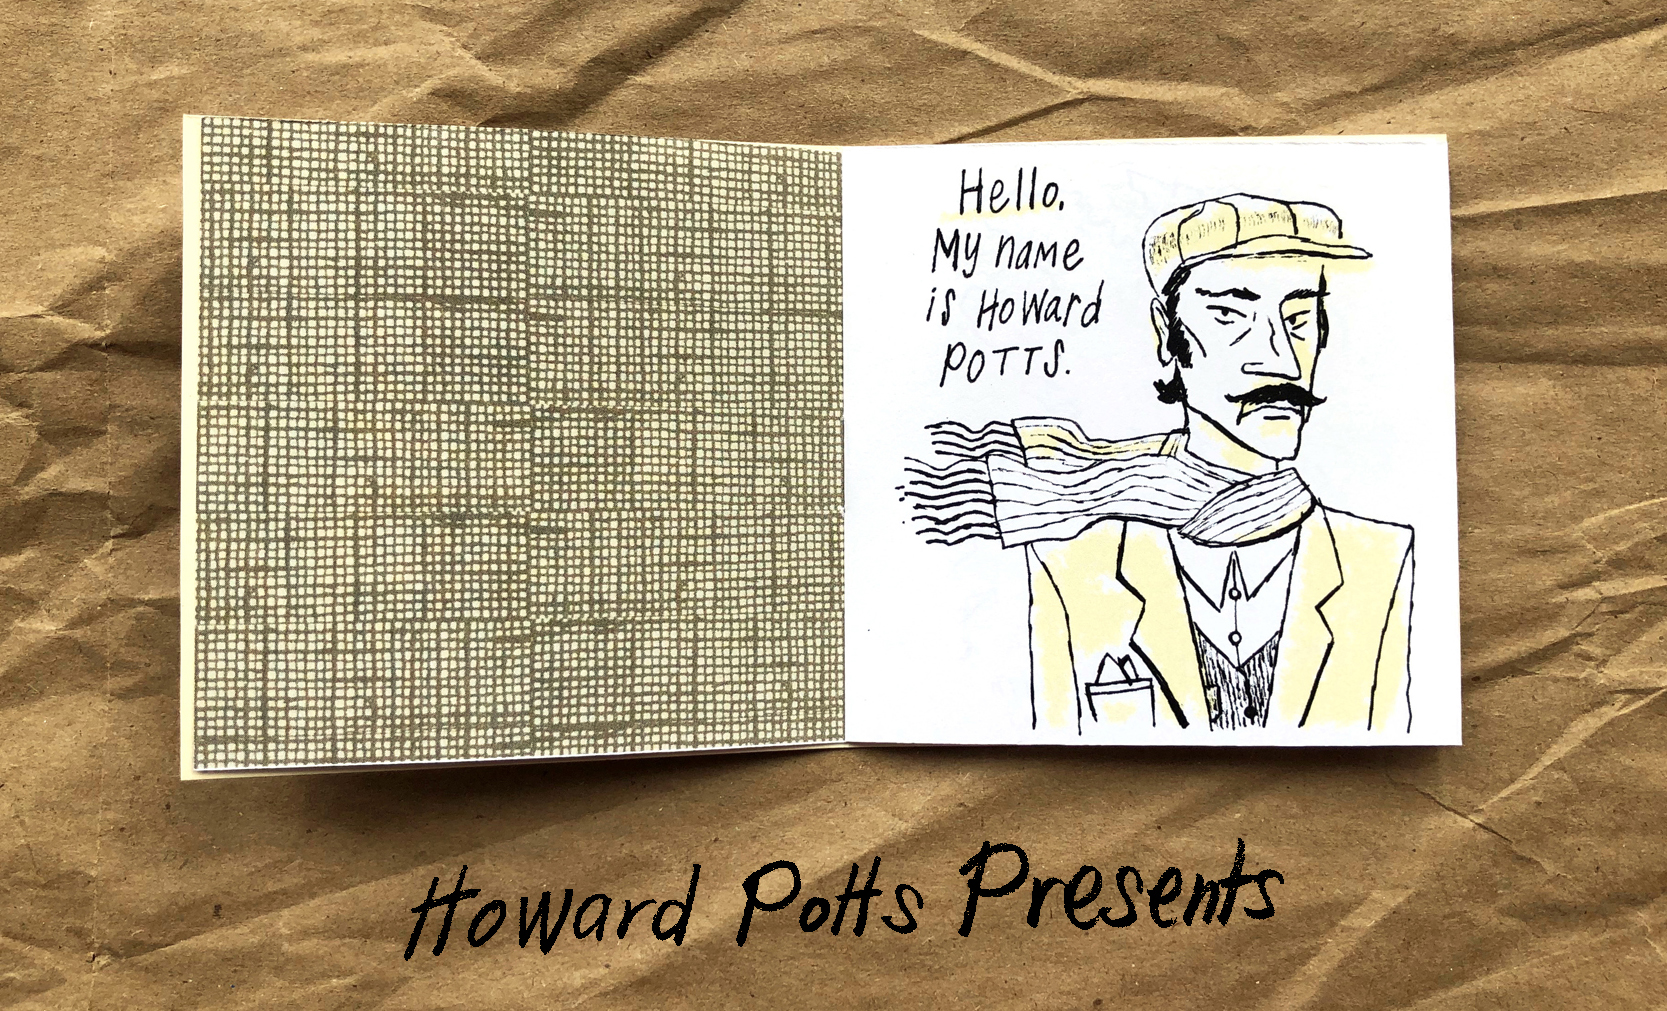 Howard Potts Presents inside front cover